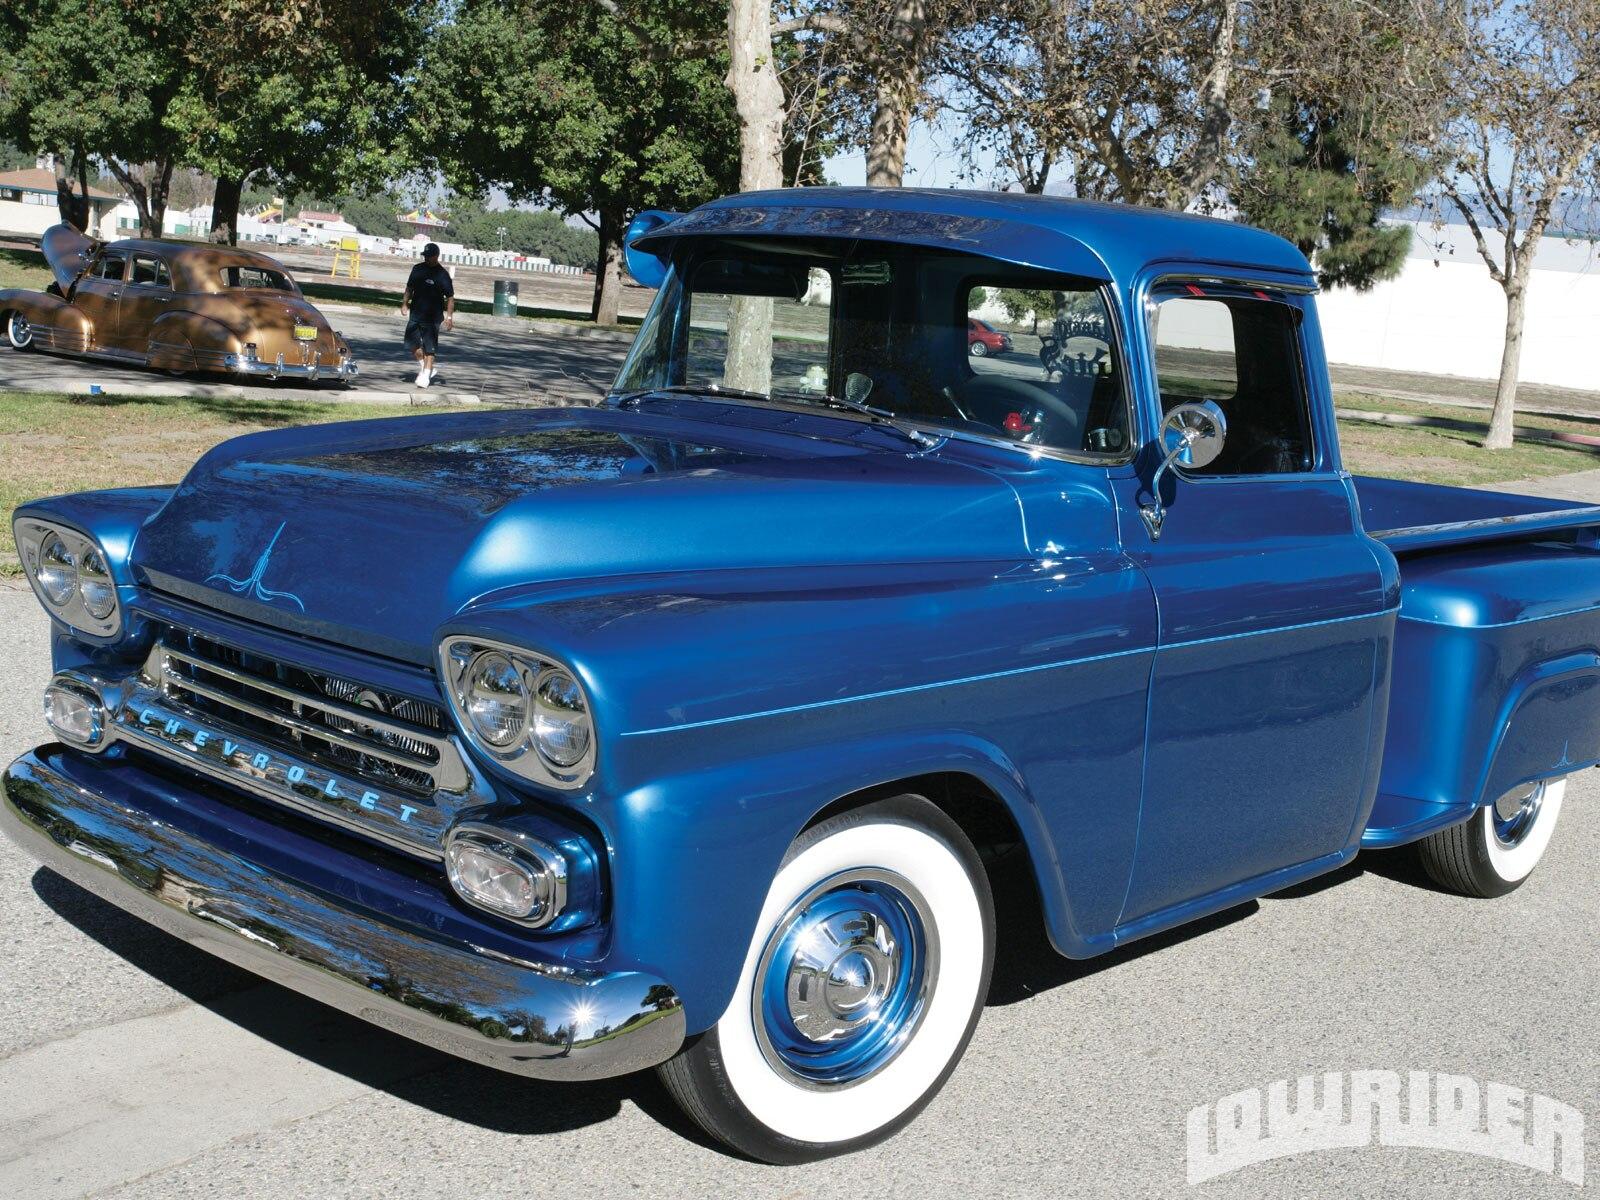 1104_lrmp_01_o-1958_chevrolet_apache-driver_side_front2